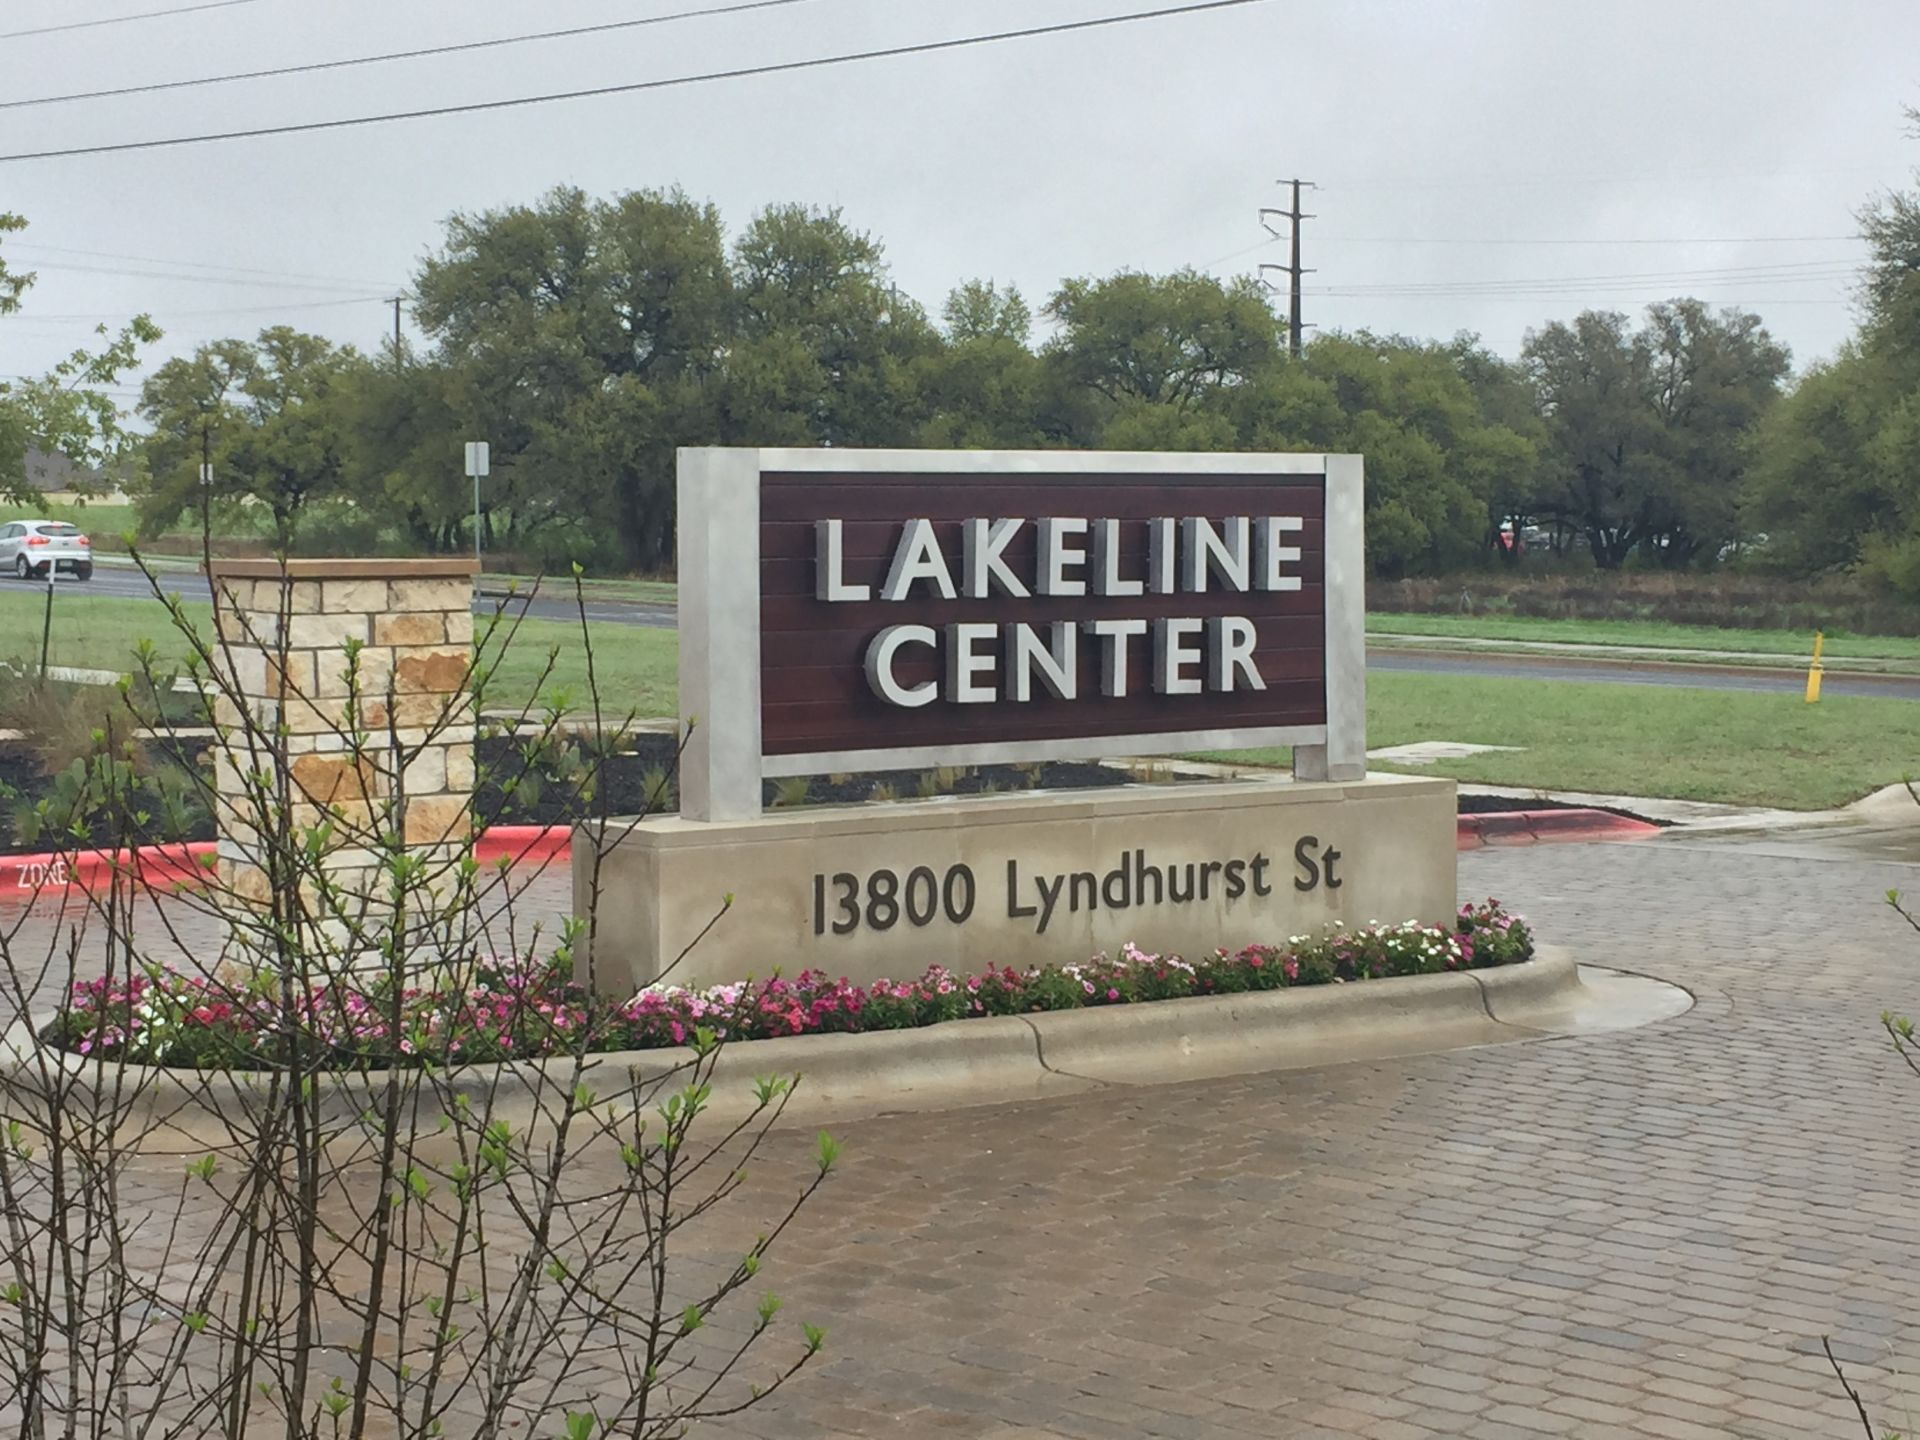 Urban Living in the Suburbs… Lakeline Center